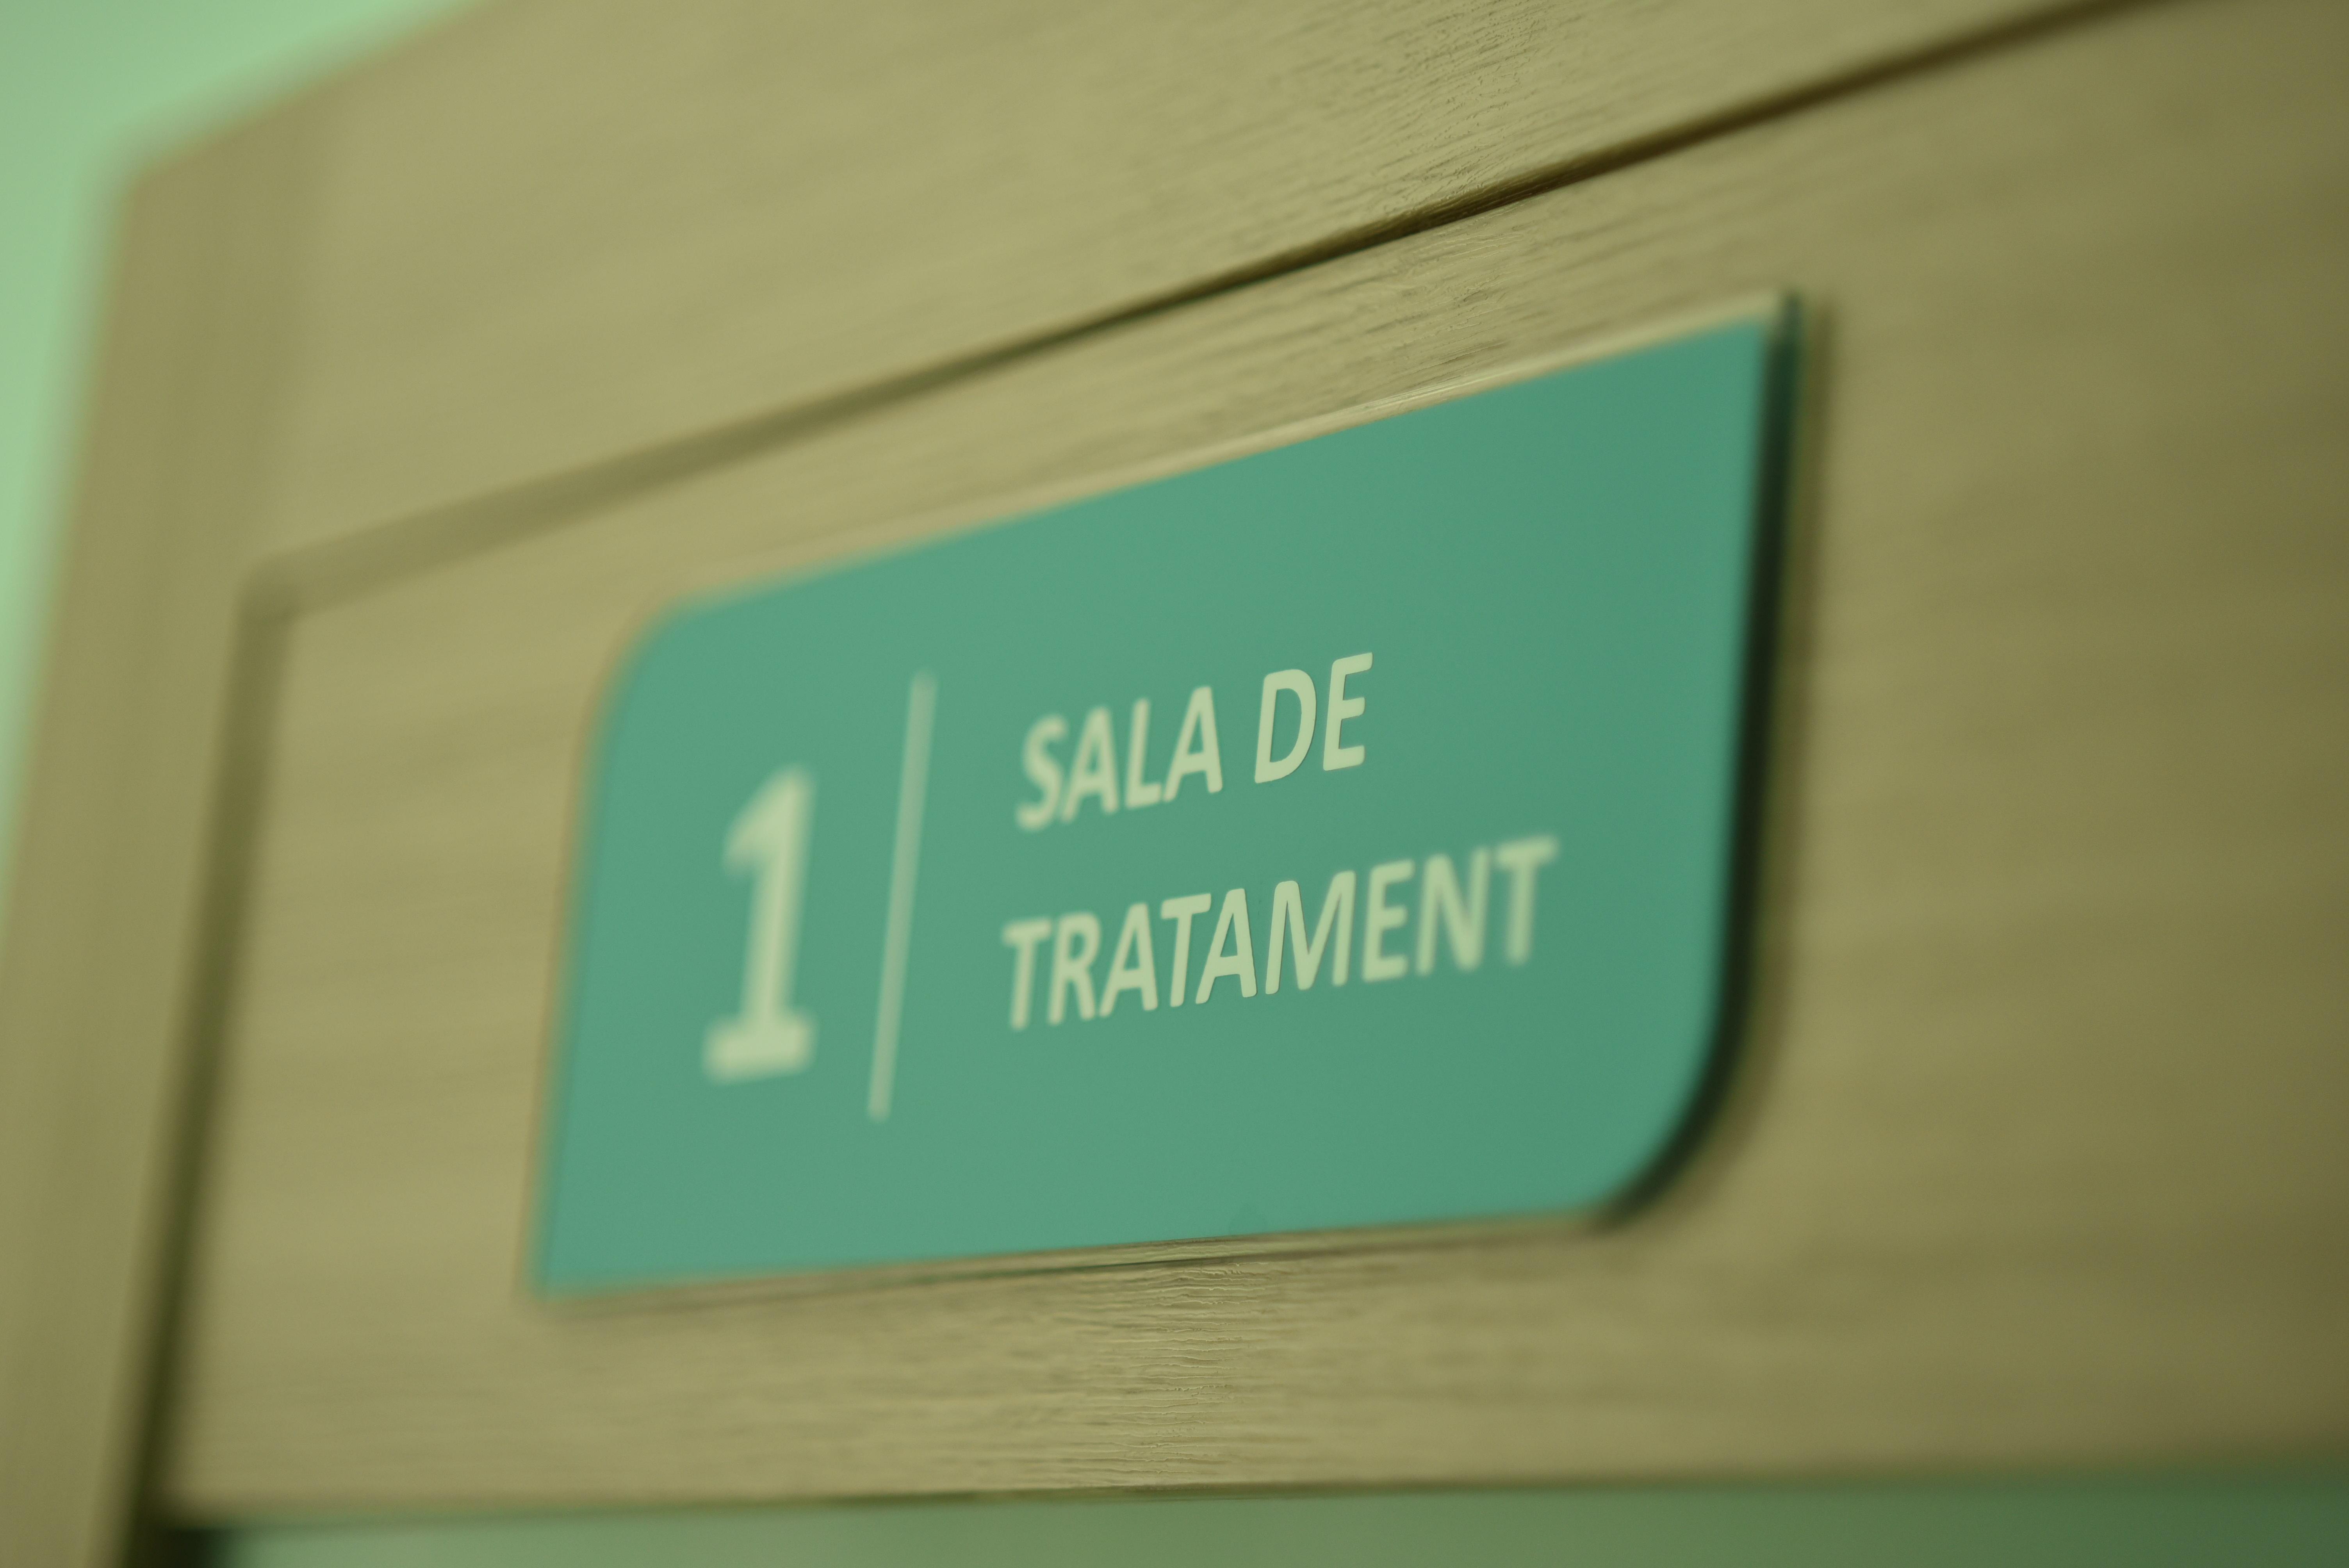 sala de tratament placa pe cabinet dentar chisinau